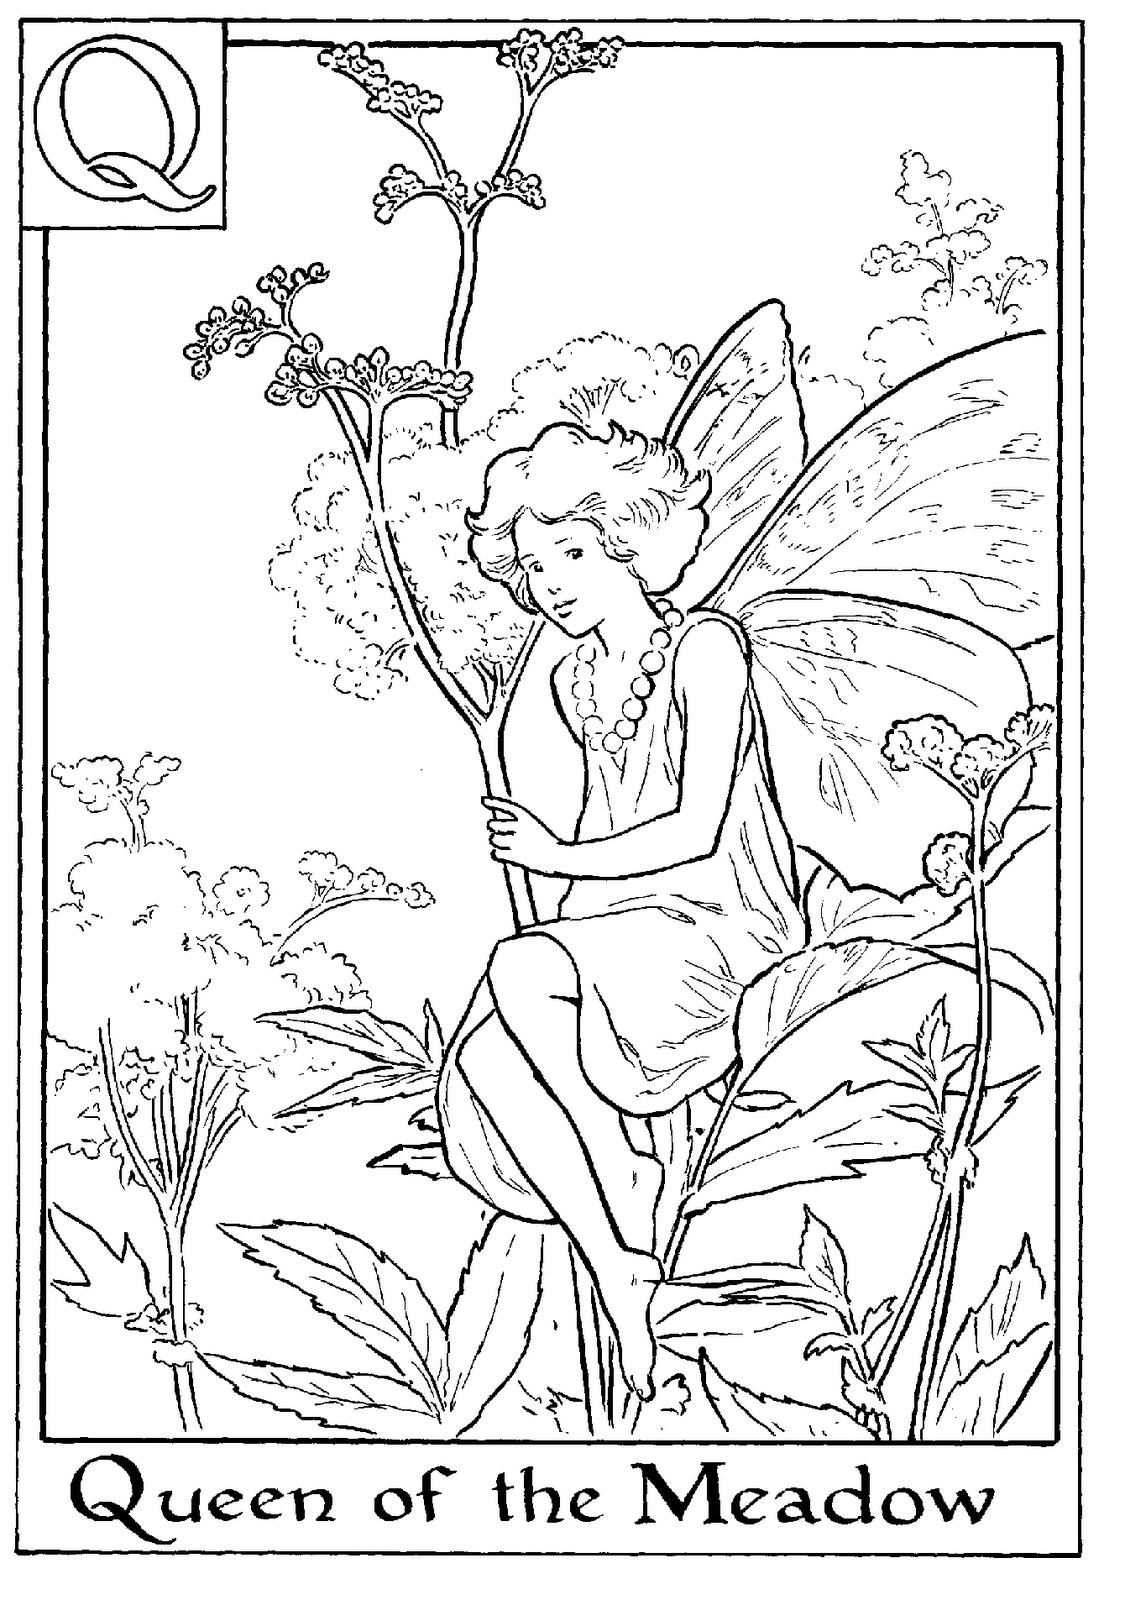 Pin by Birgit Keys on Clip Art Fairies | Pinterest | Fairy, Flower ...